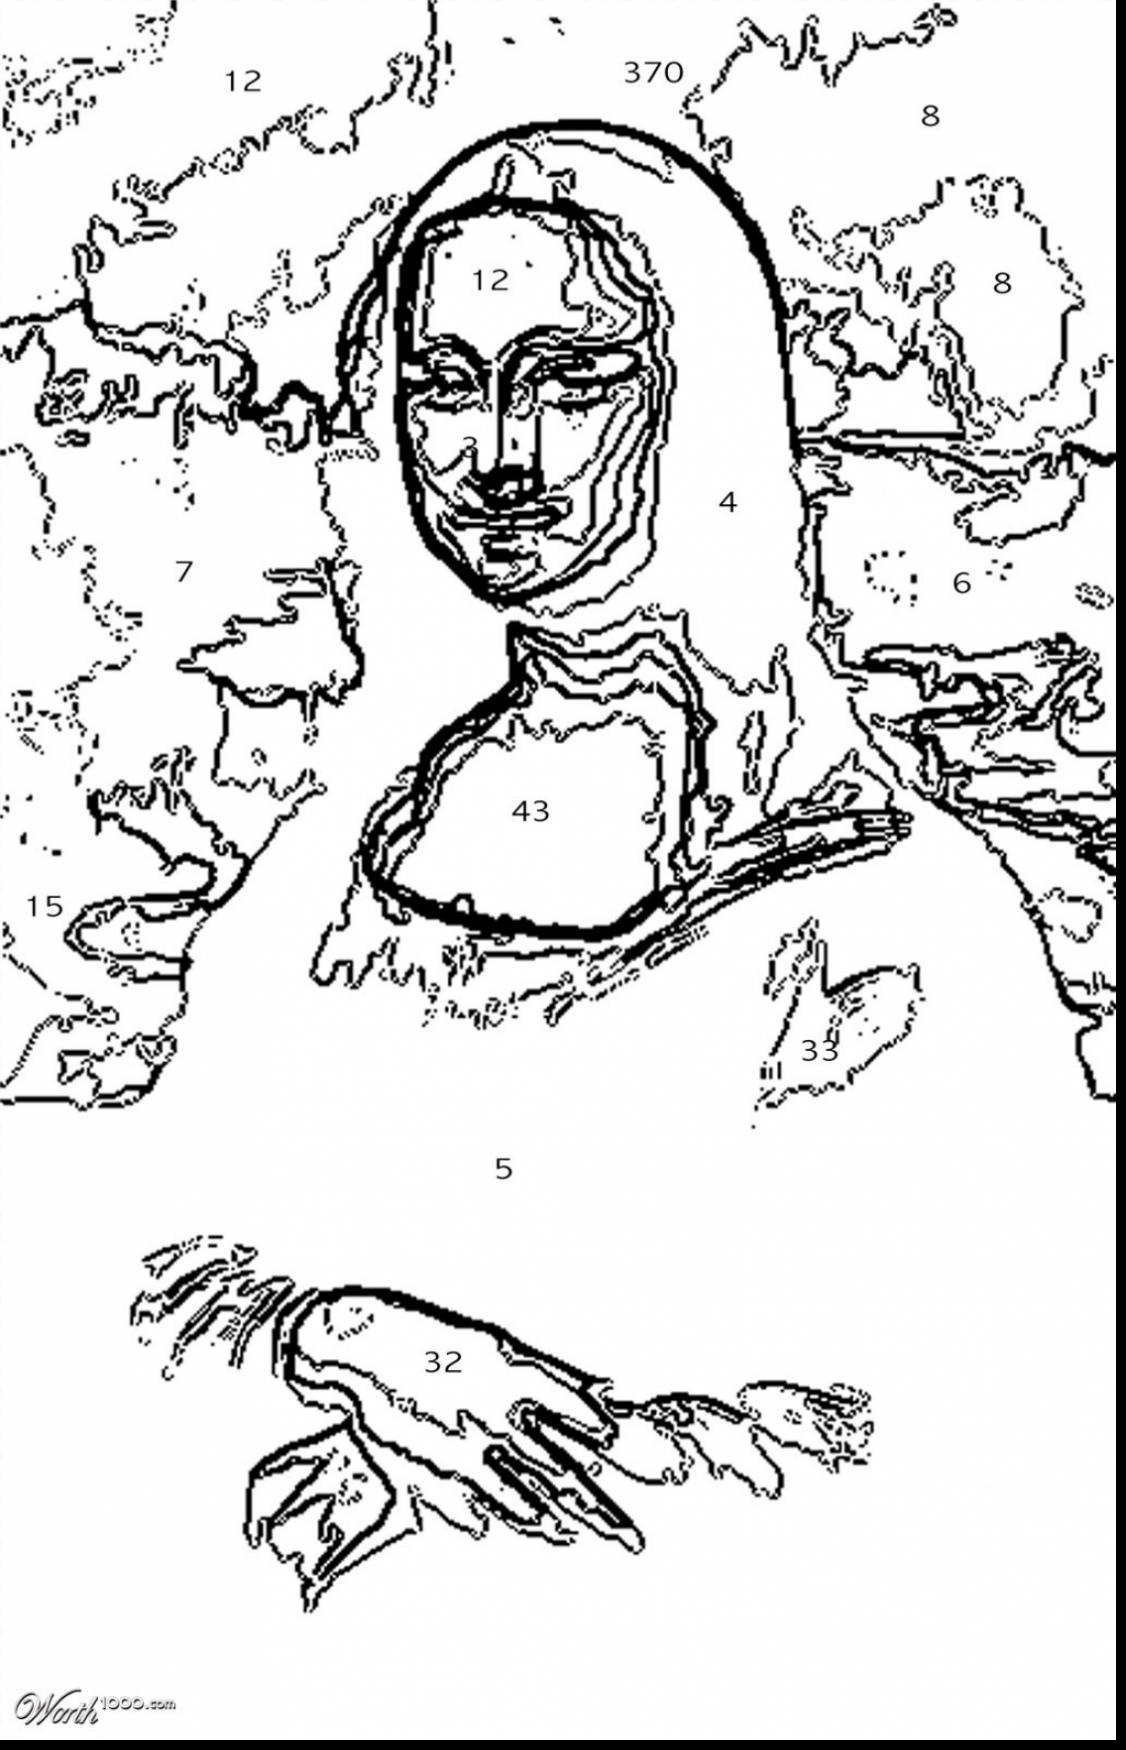 1126x1750 Cool Great Leonardo Da Vinci Coloring Pages With Mona Lisa